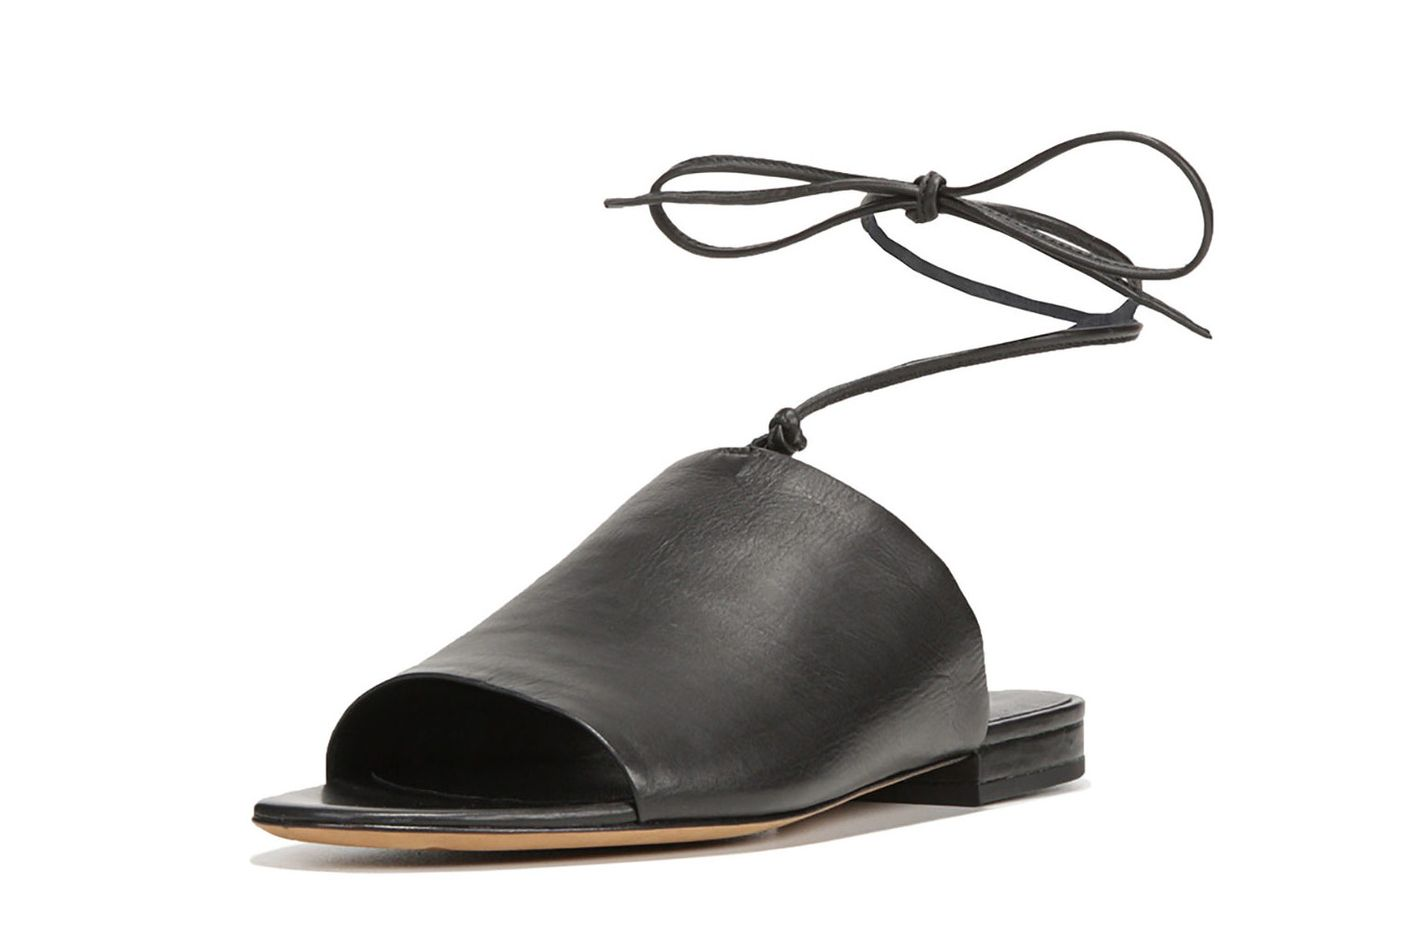 Vince Damon Leather Ankle-Tie Mule